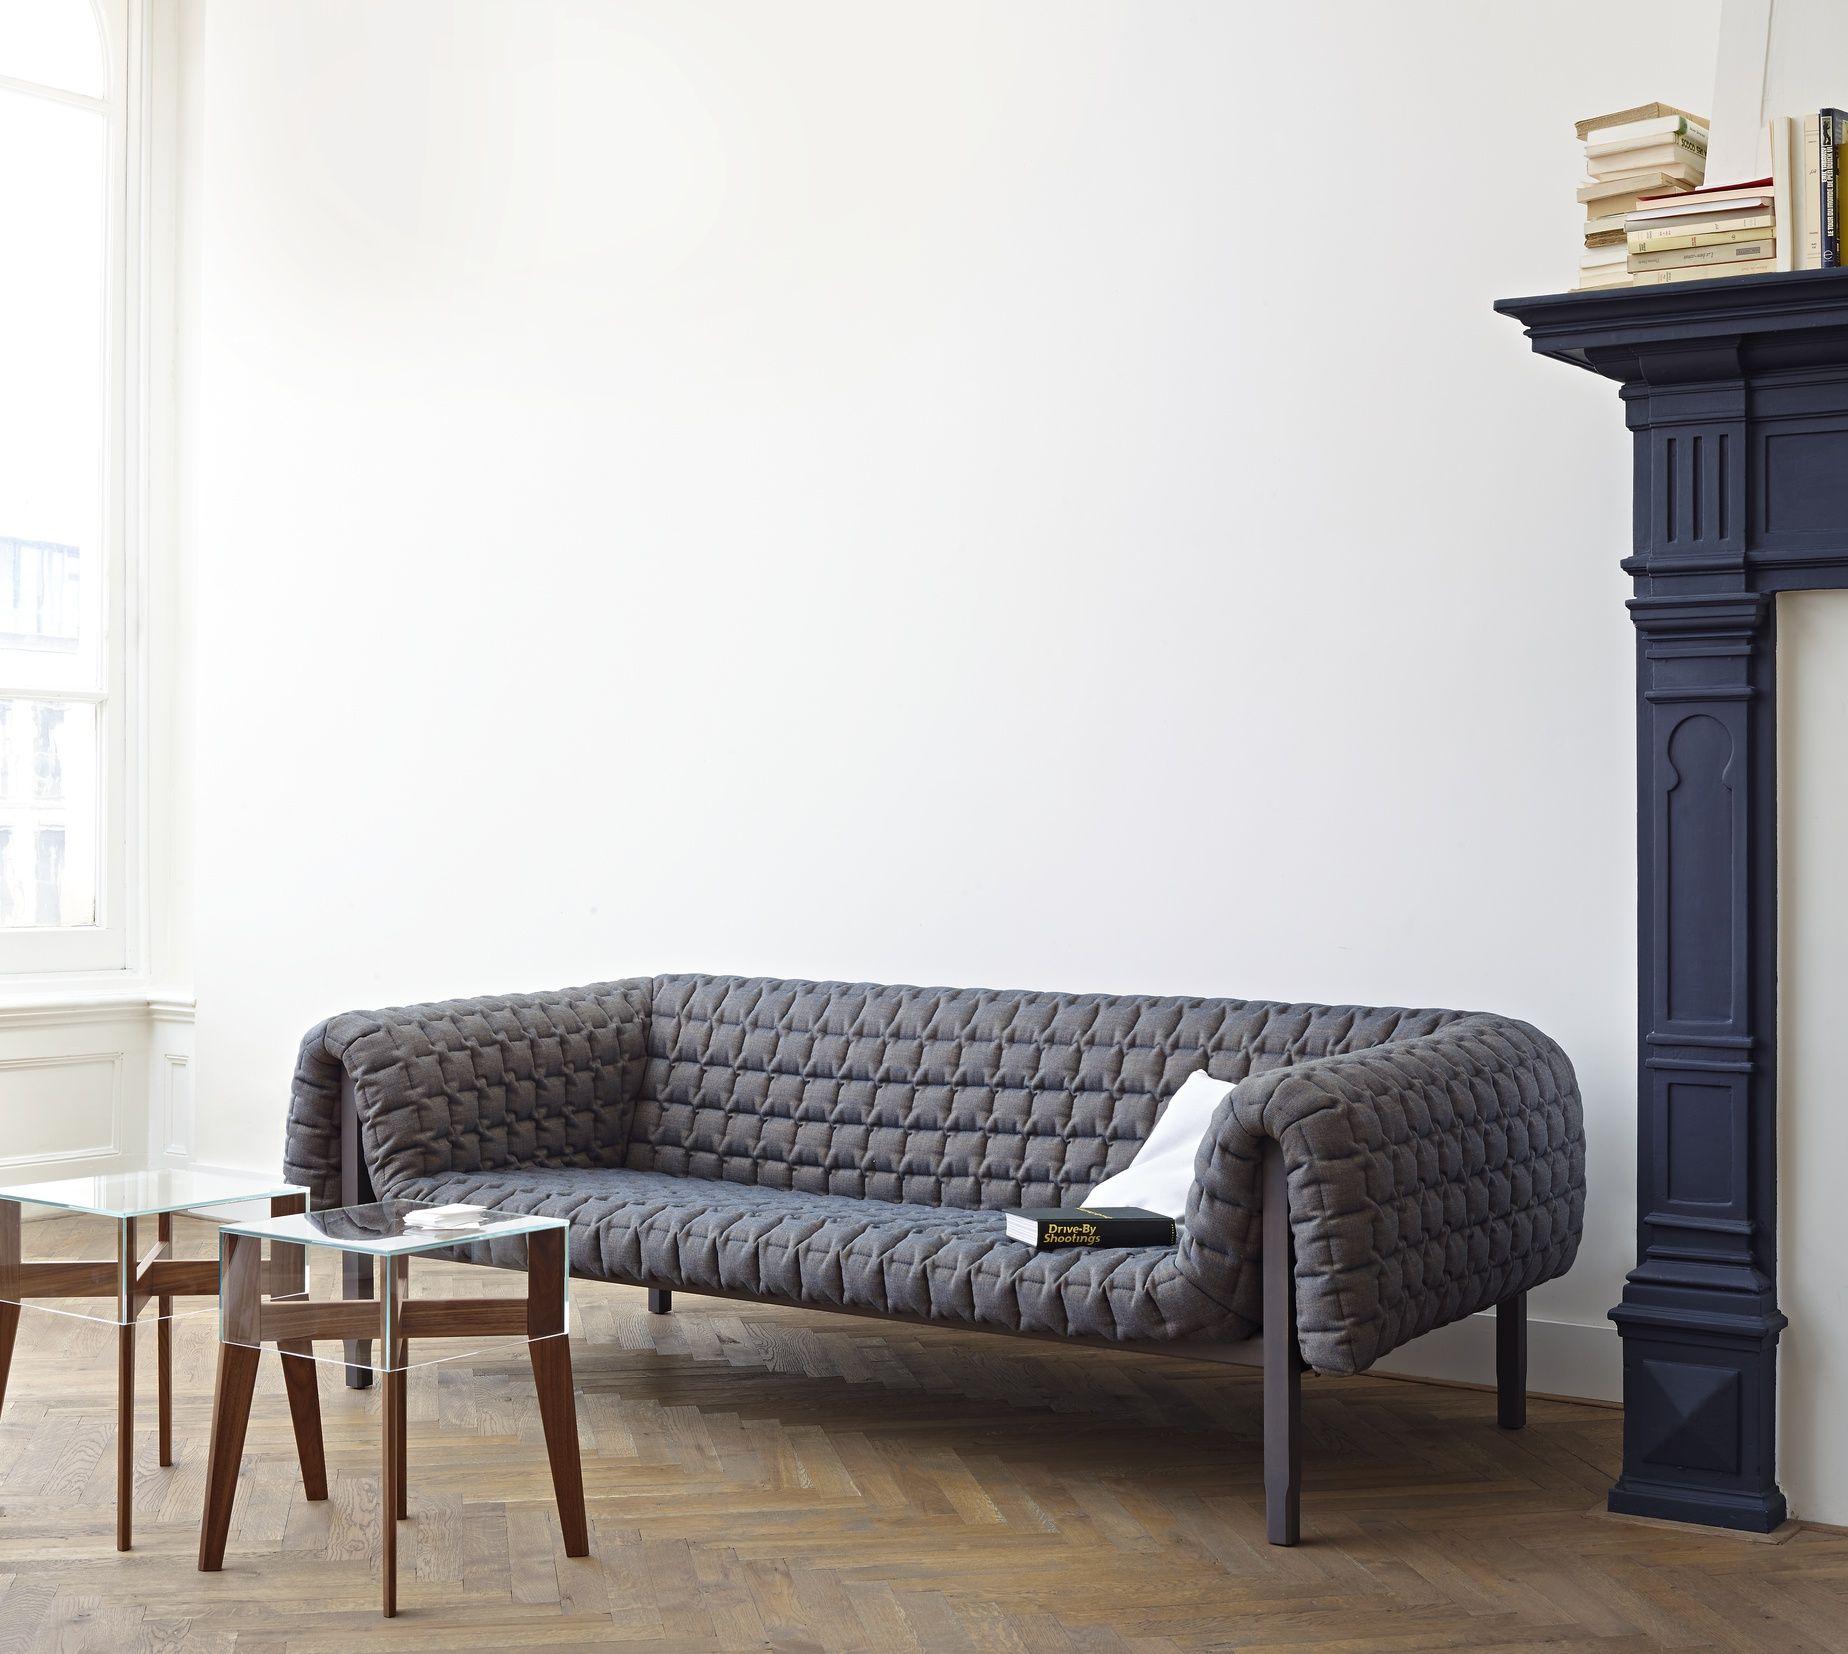 Ruche Sofas Designer Inga Sempe Ligne Roset Furniture En 2018